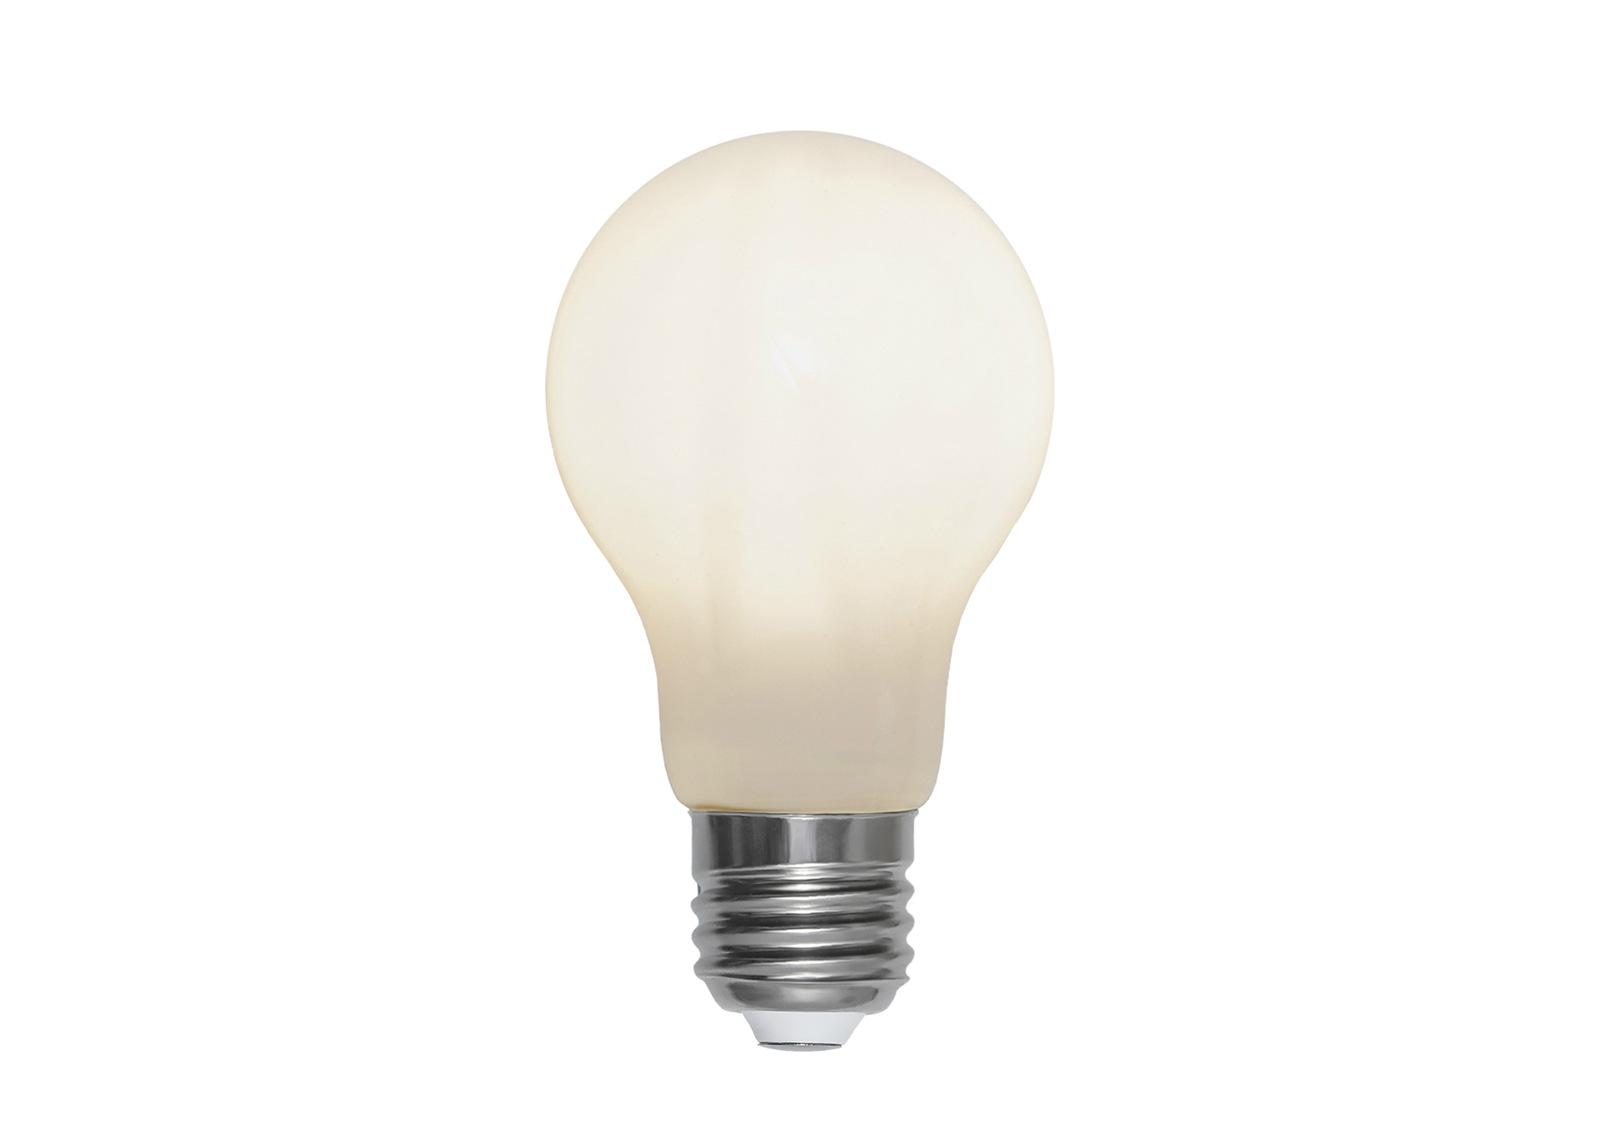 LED sähkölamppu E27 7,5 W